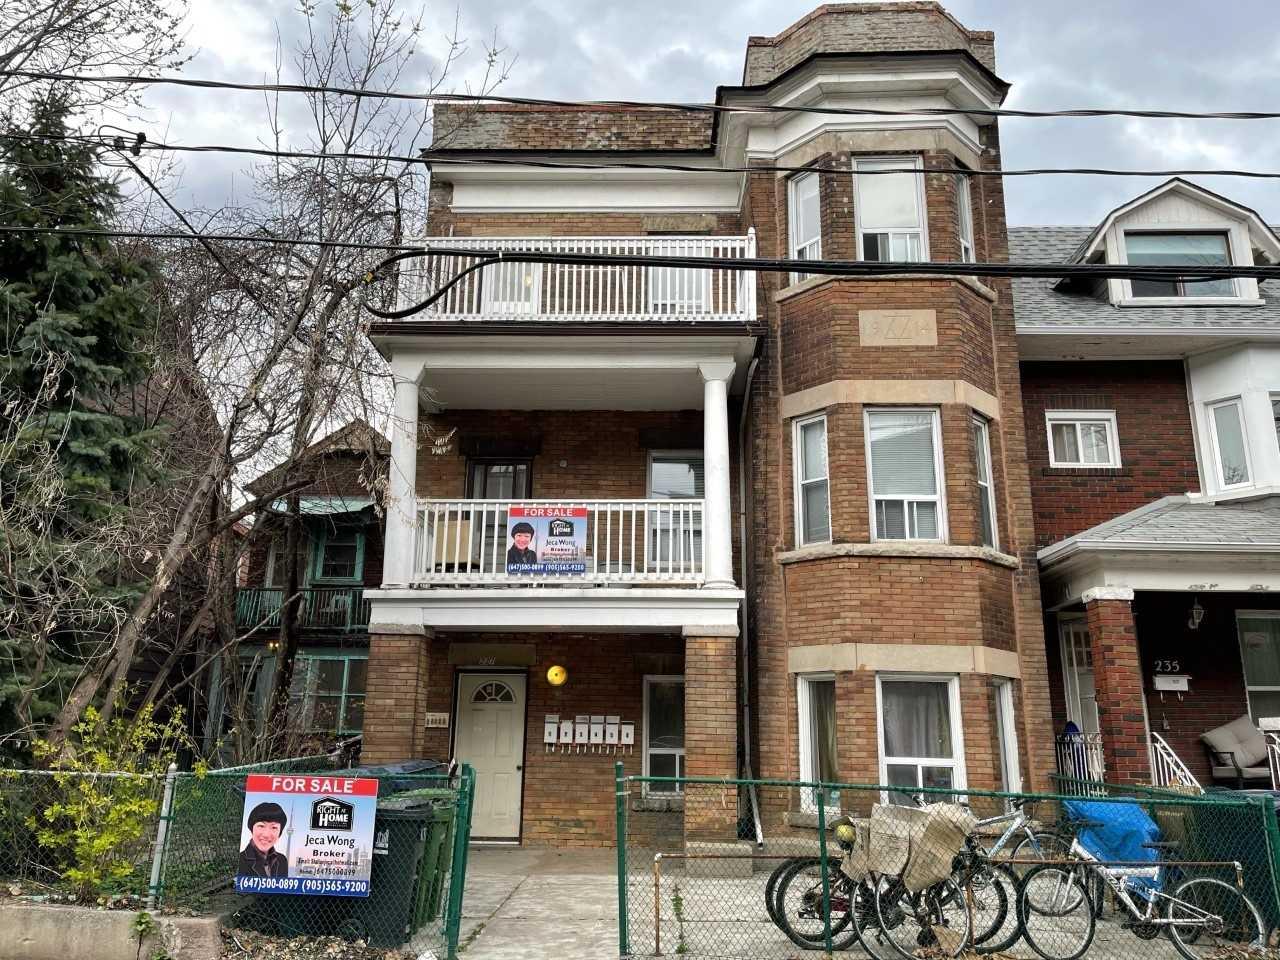 237 Manning Ave, Toronto, Ontario M6J2K8, 9 Bedrooms Bedrooms, 30 Rooms Rooms,6 BathroomsBathrooms,Multiplex,For Sale,Manning,C5160992